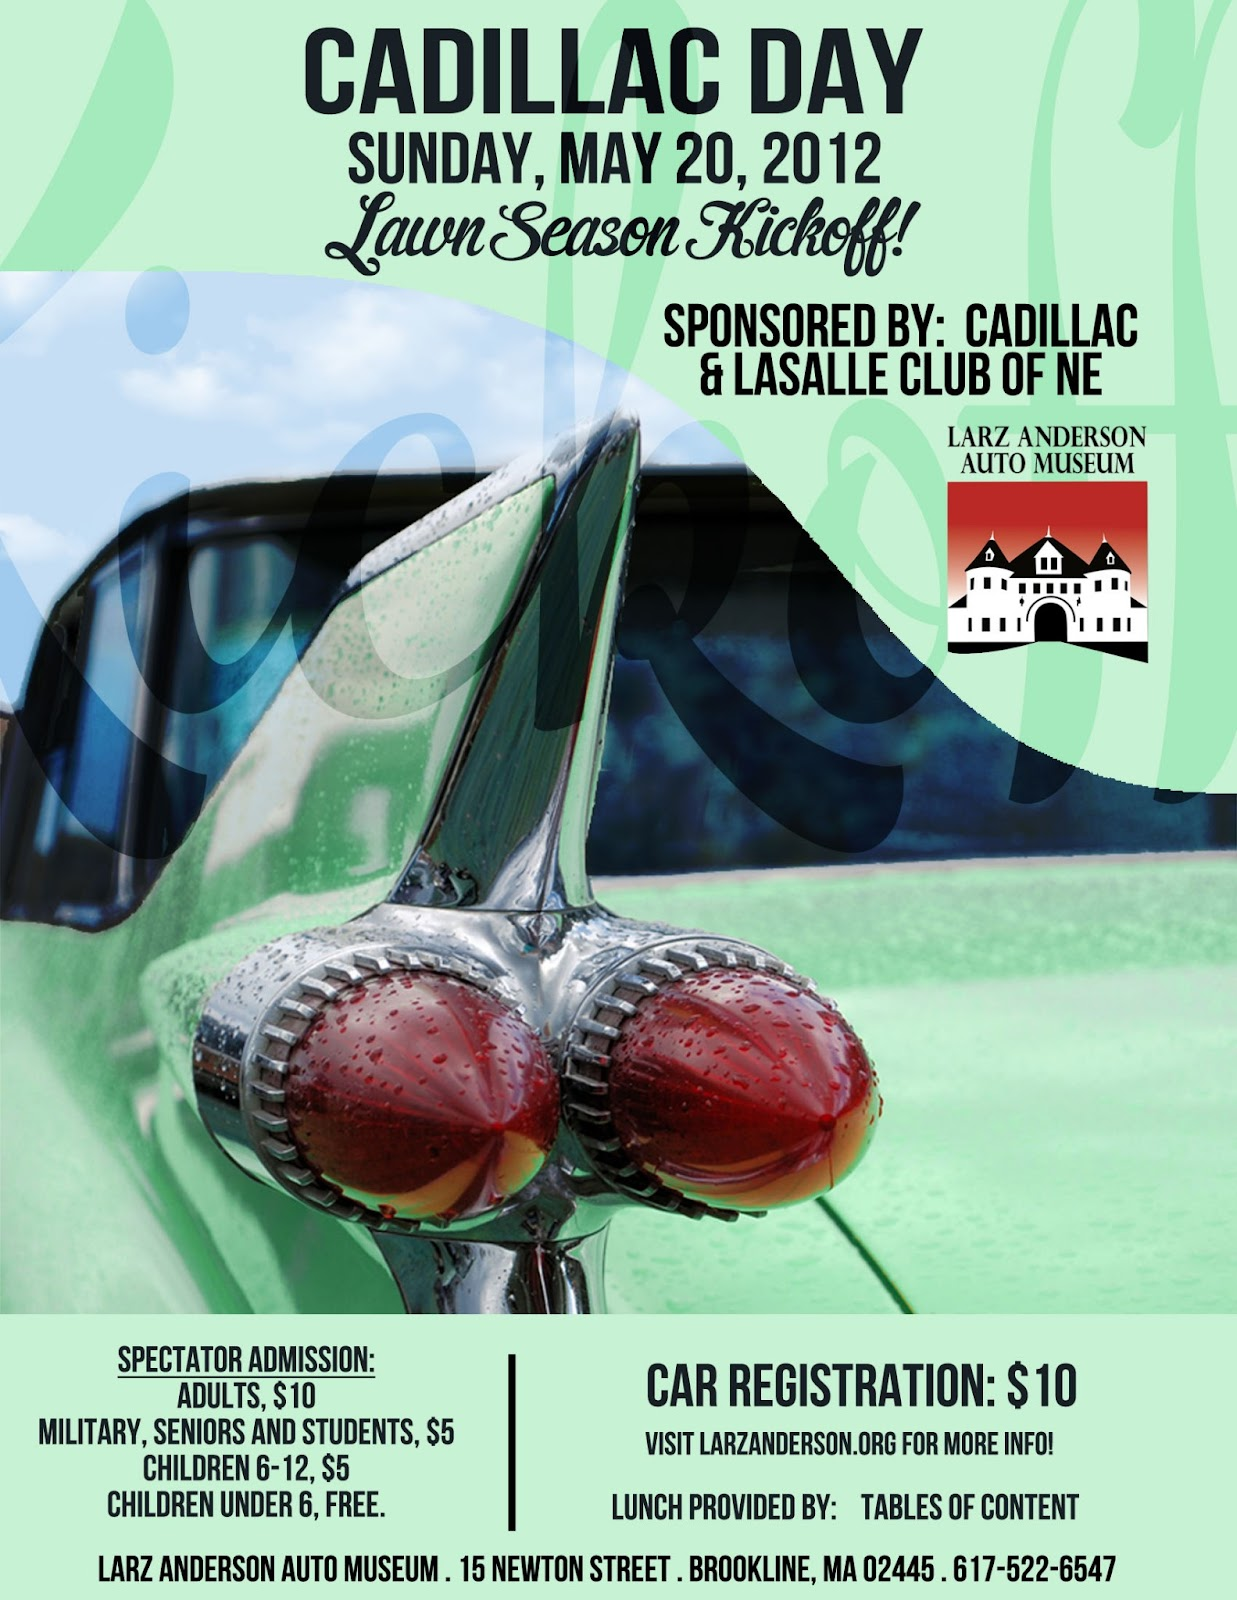 Massachusetts Car Shows - New England car show calendar